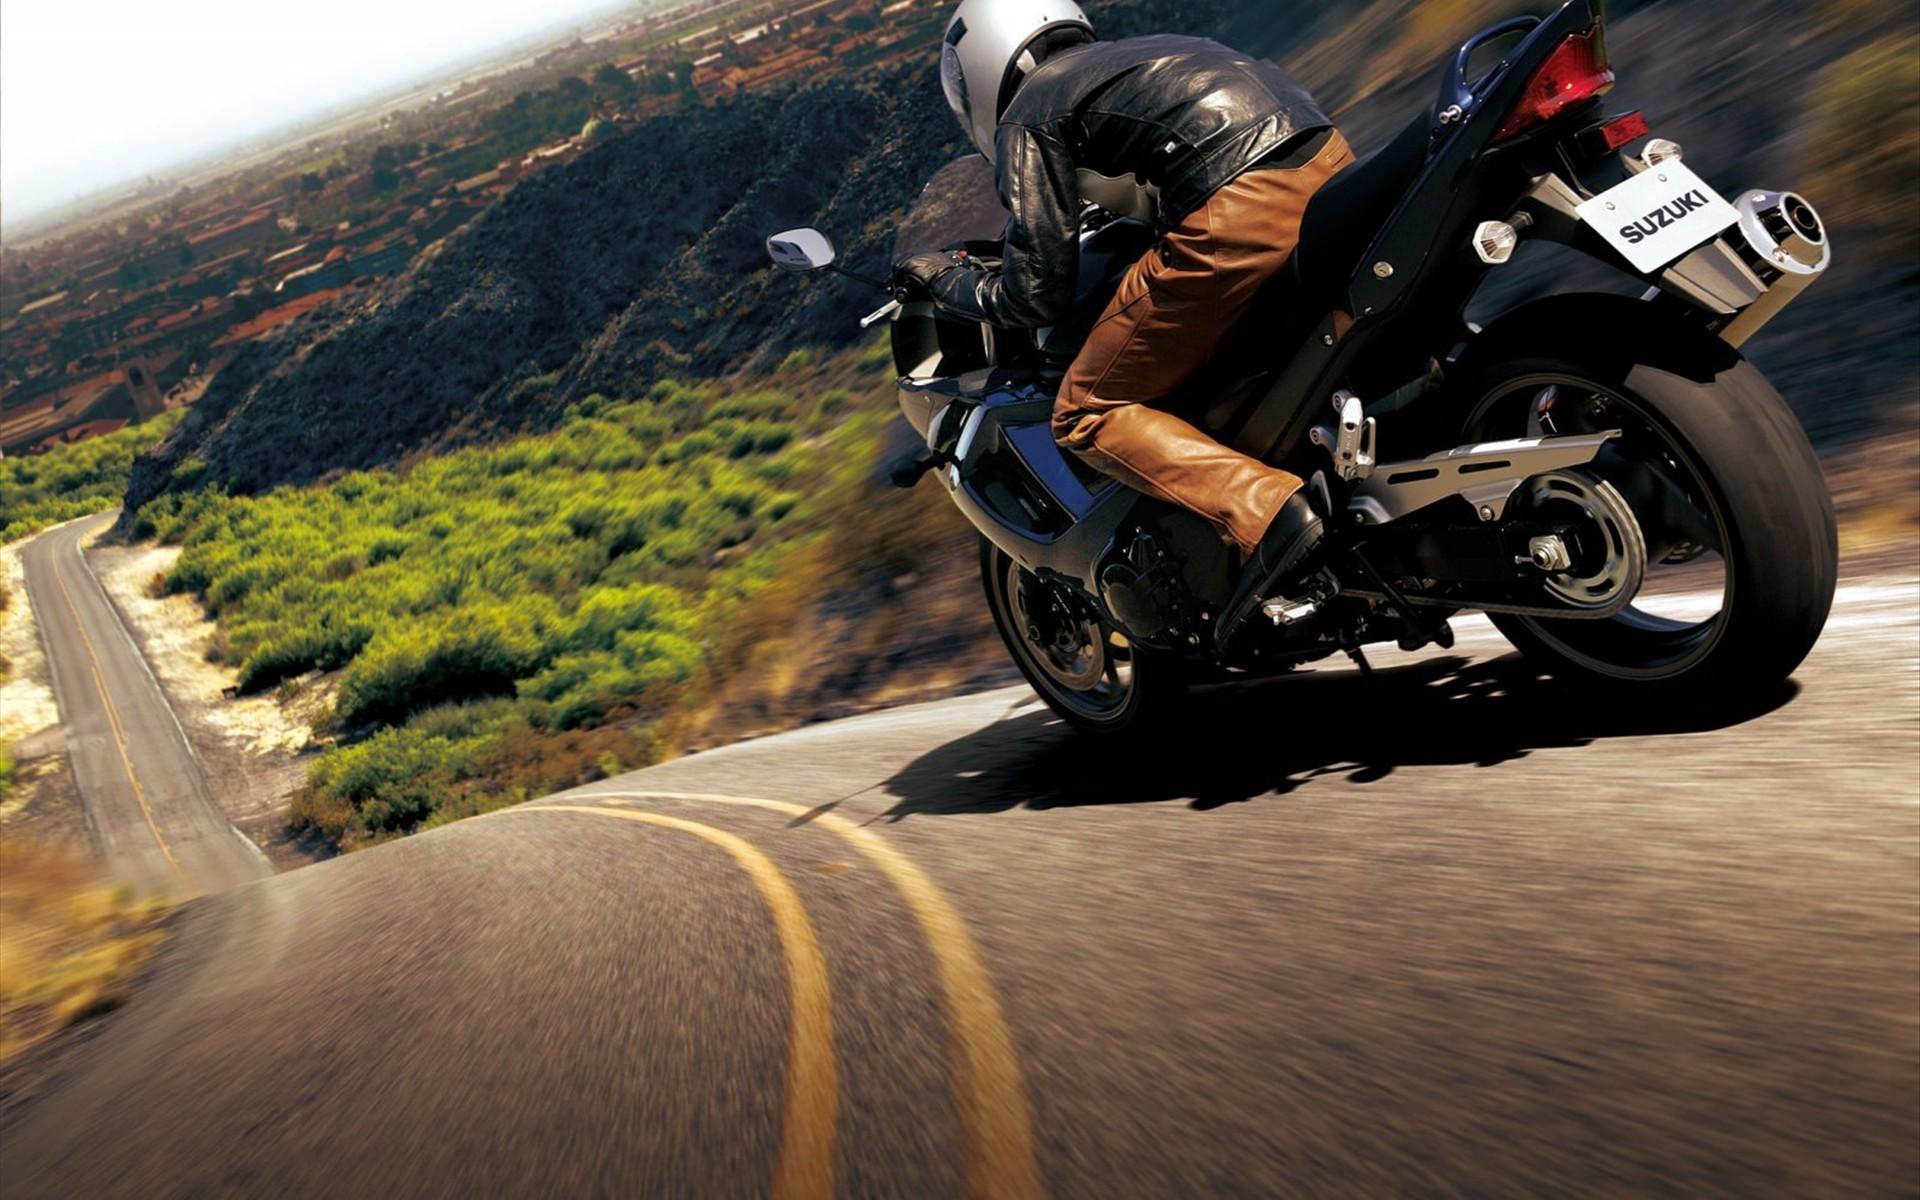 Мотоцикл, байк, обои на рабочий стол, дорог